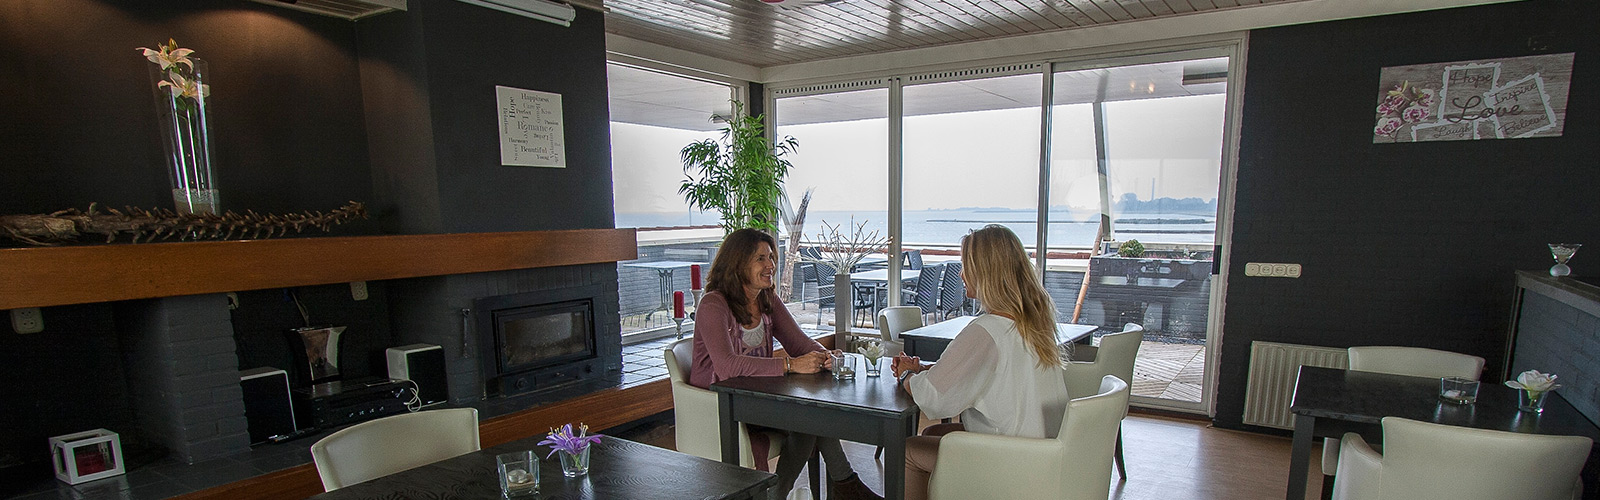 penthouse-a-la-mer-1600x500